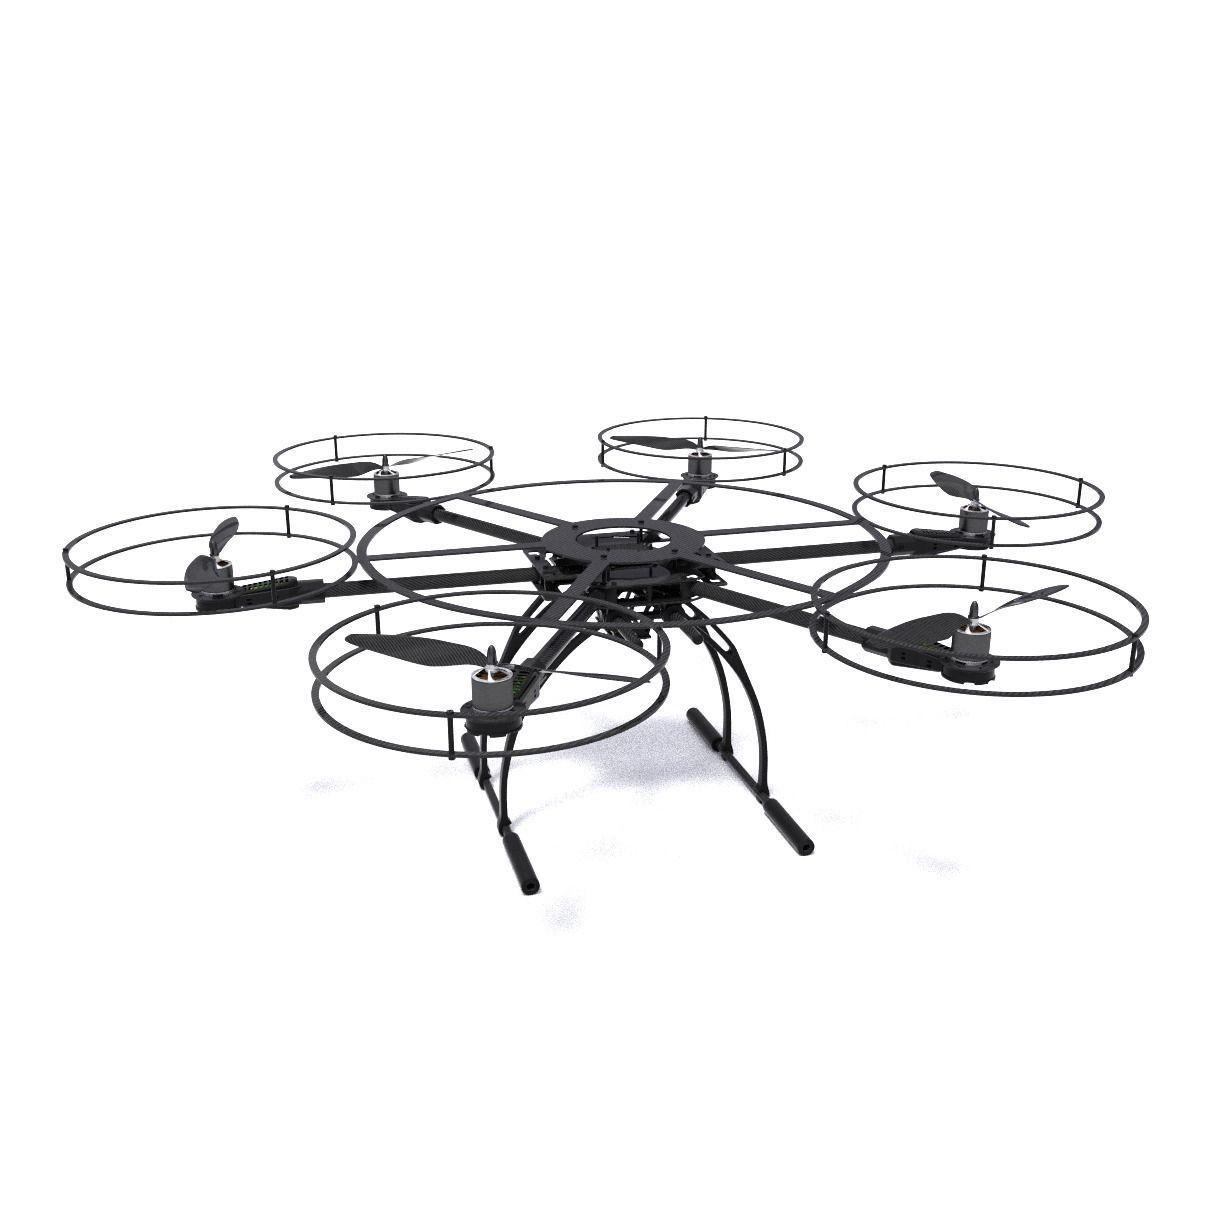 Hexacopter Drone 3d Model Obj Fbx Dxf L Blend